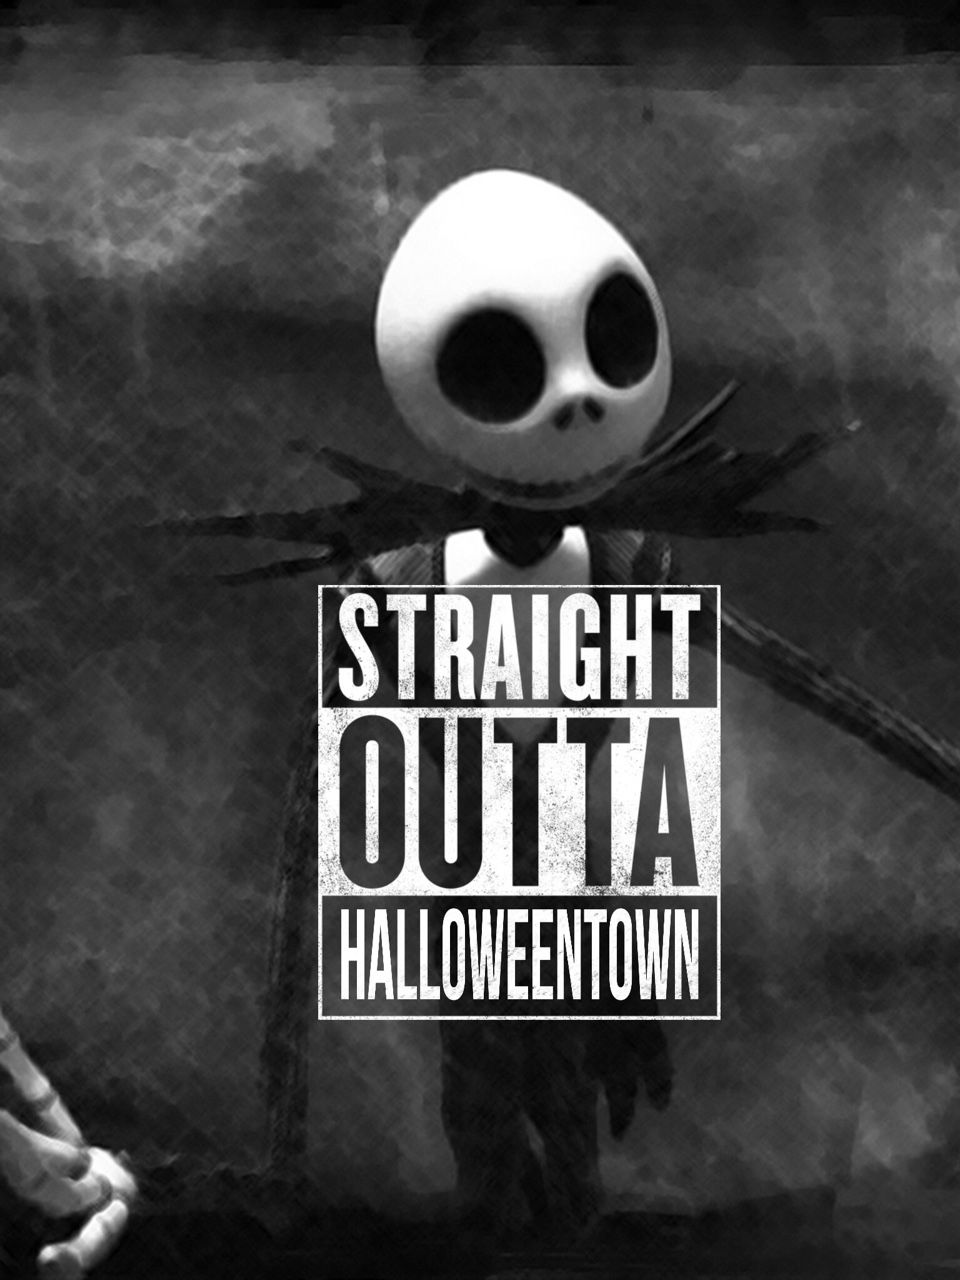 Straight Outta Holloweentown Nightmare before christmas